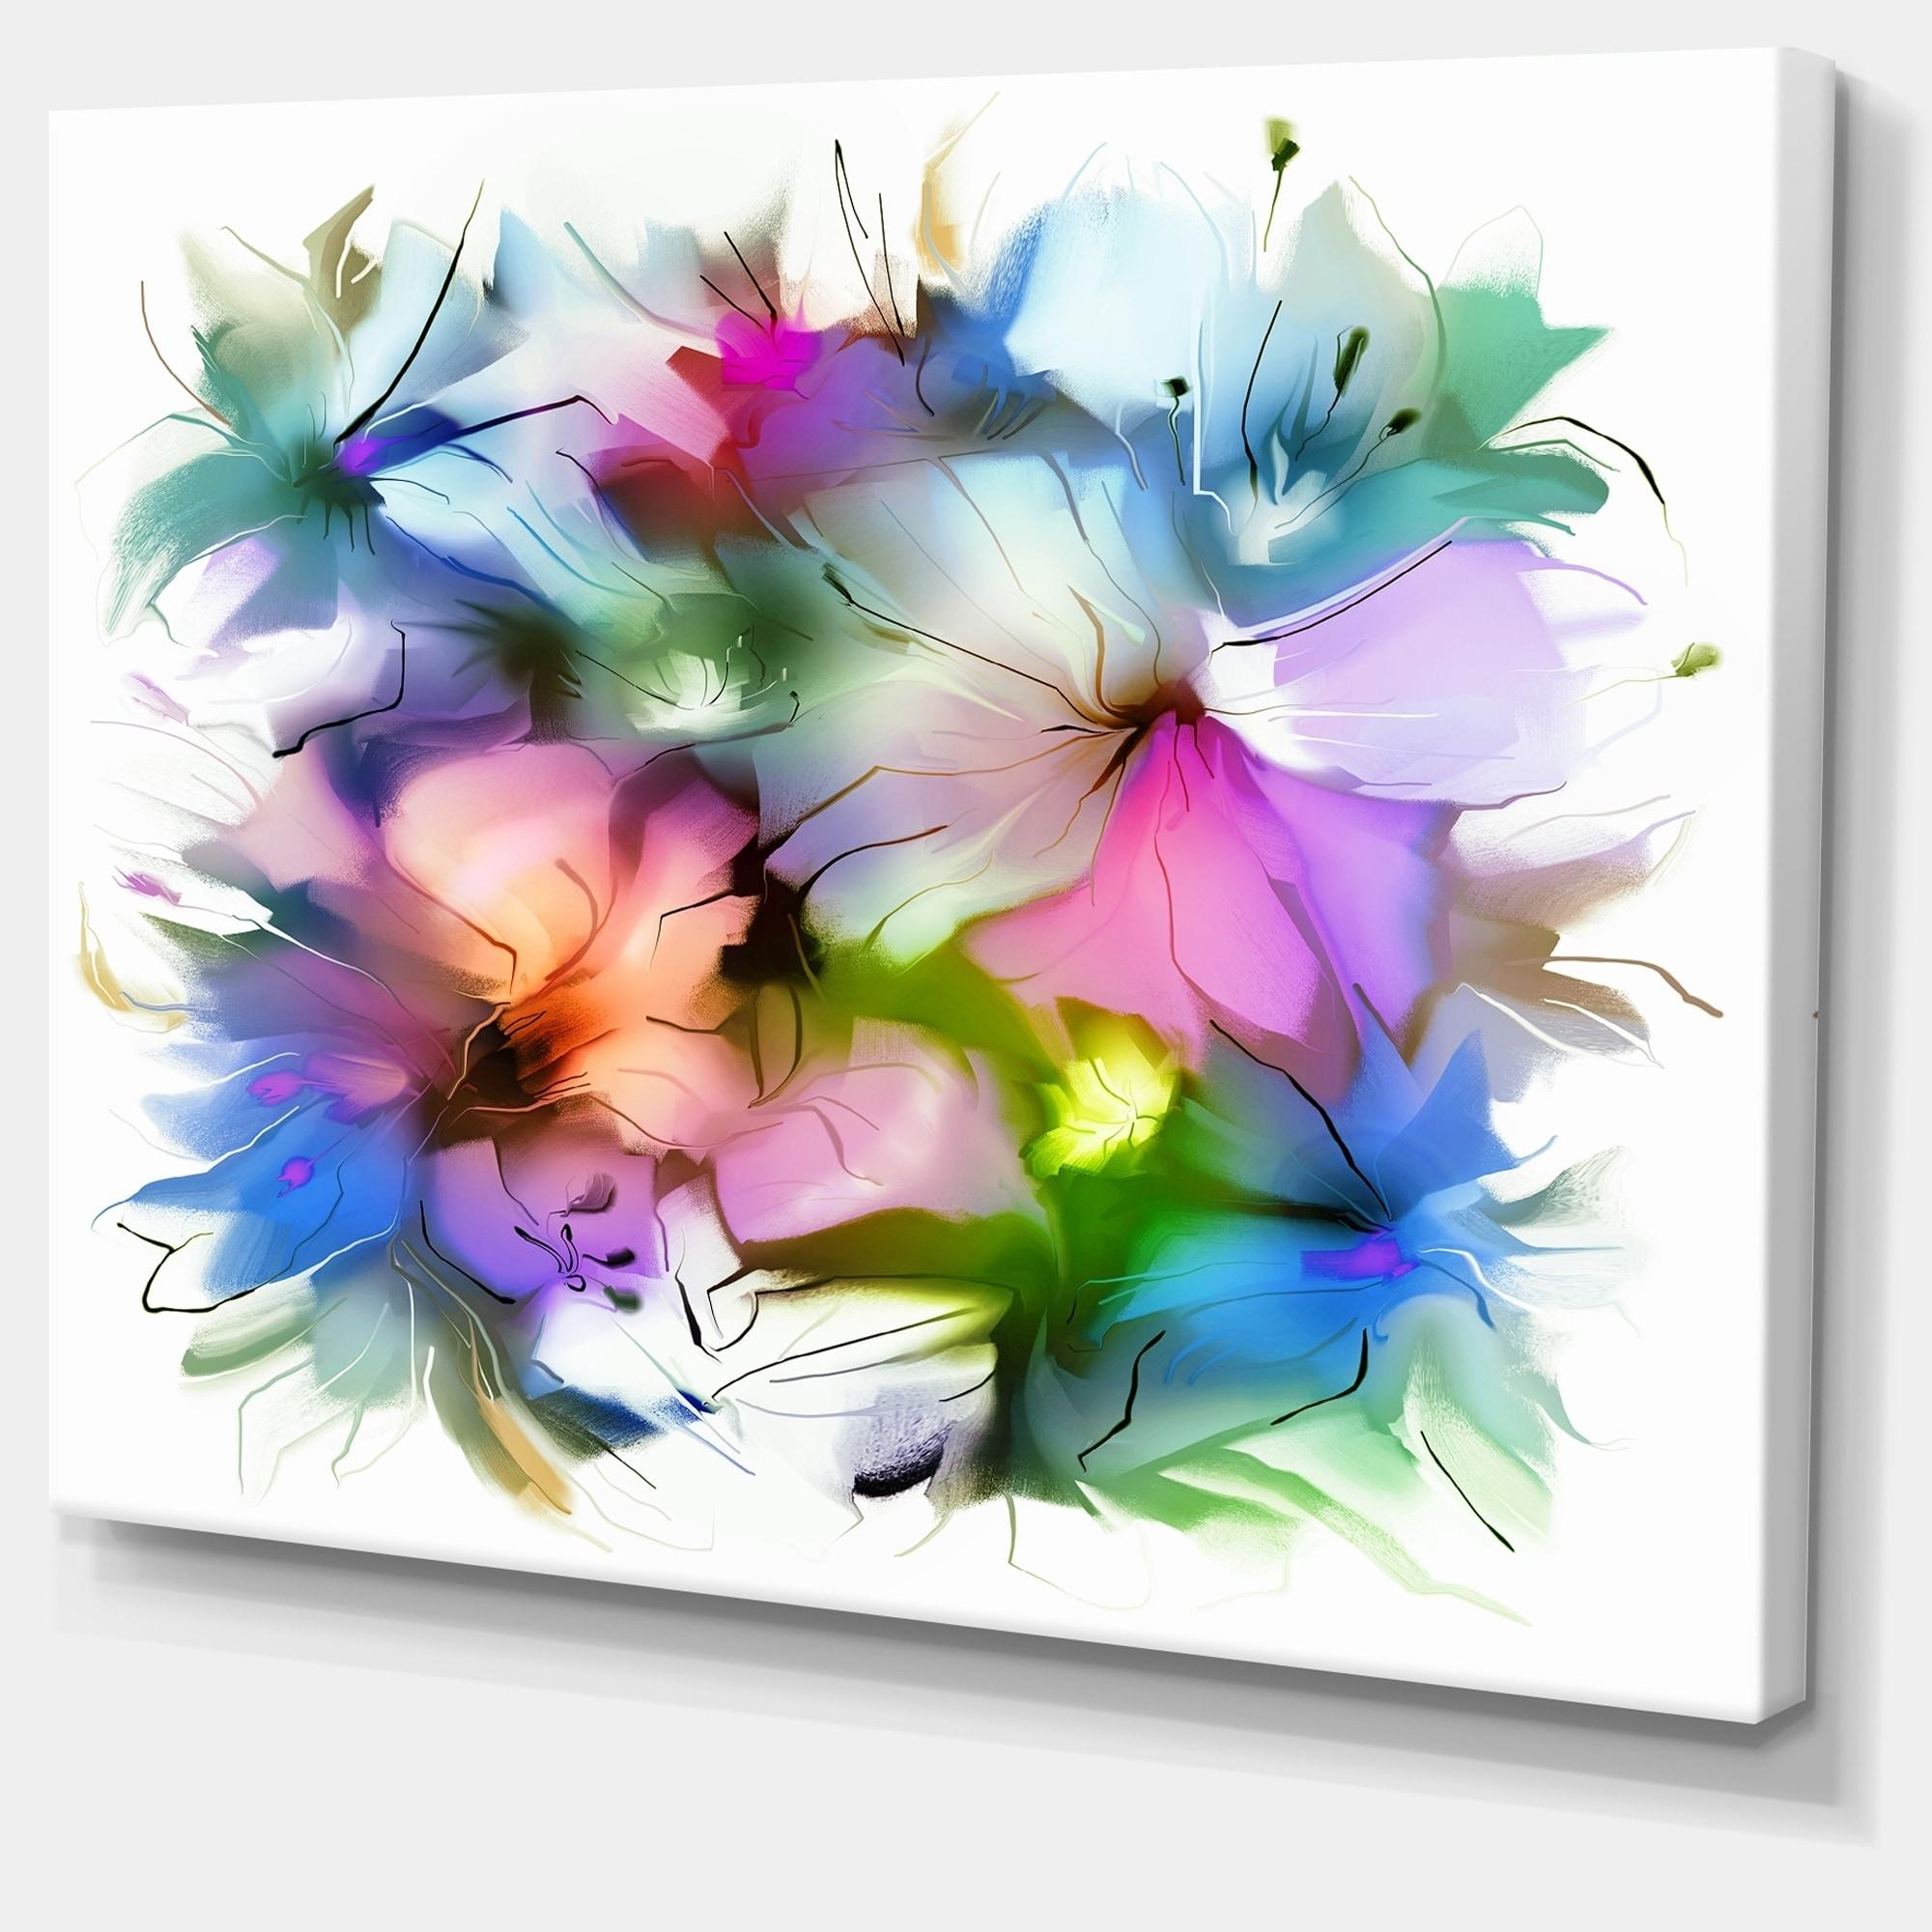 Shop Designart Watercolor Floral Bouquet Extra Large Floral Wall